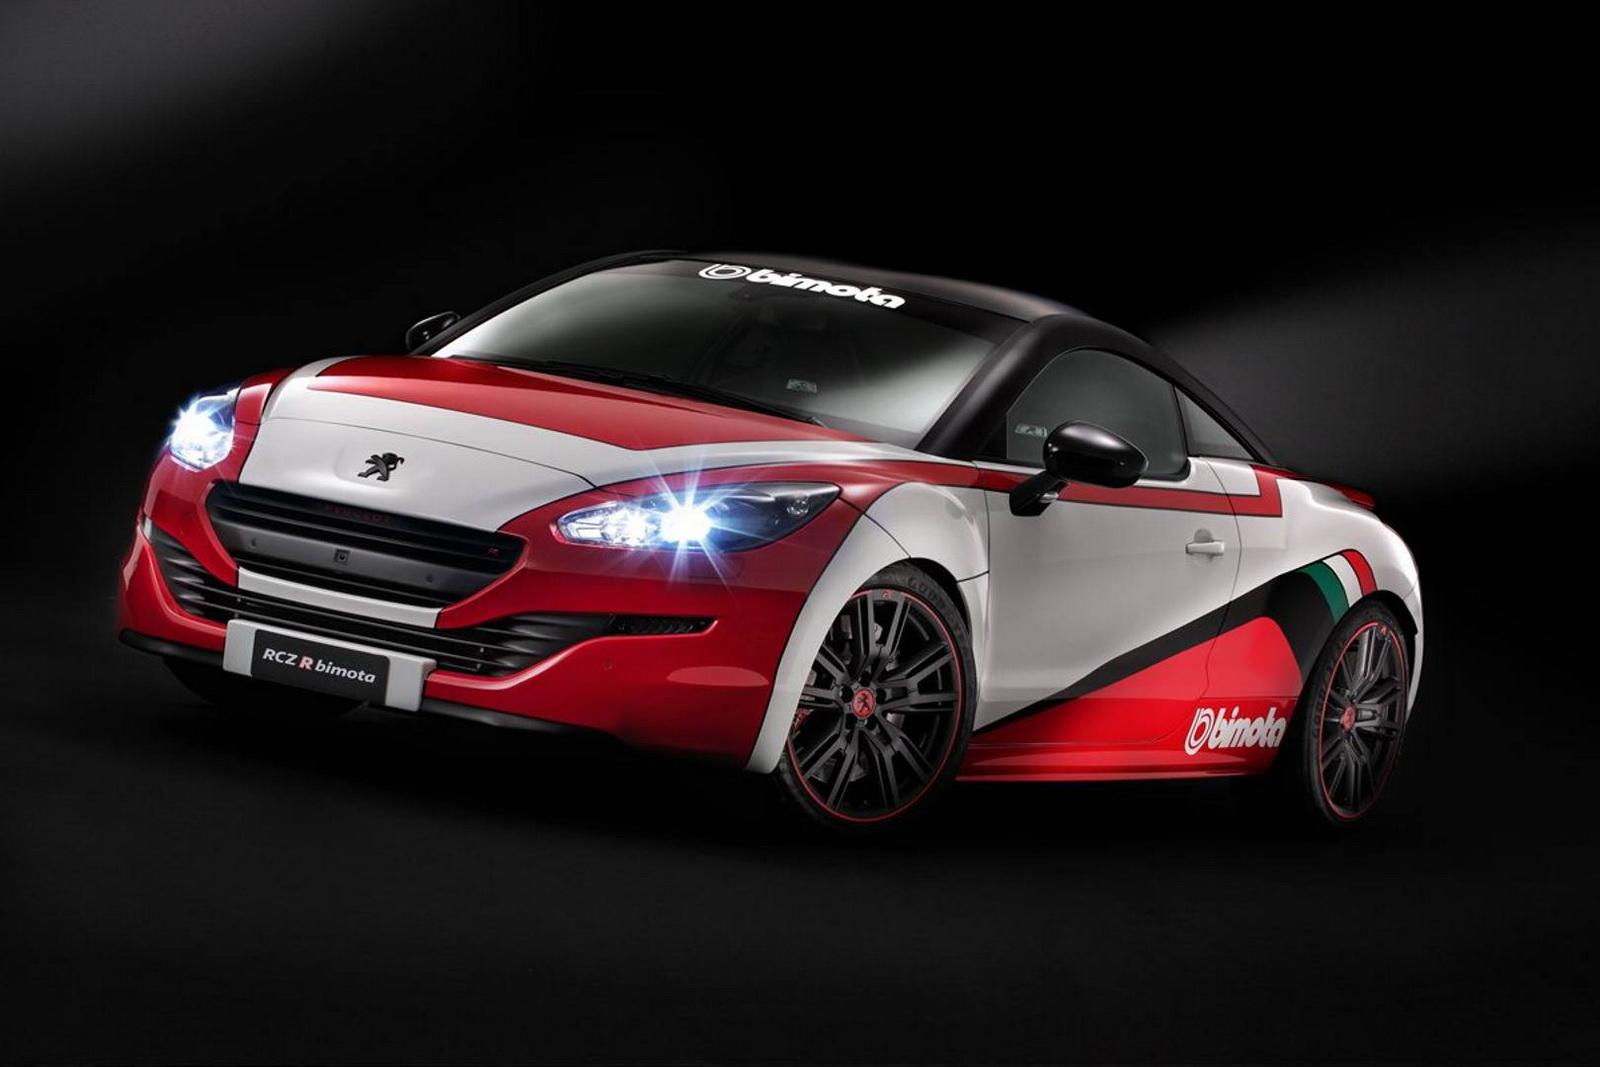 Official: 2015 Peugeot RCZ R Bimoto Special Edition - GTspirit